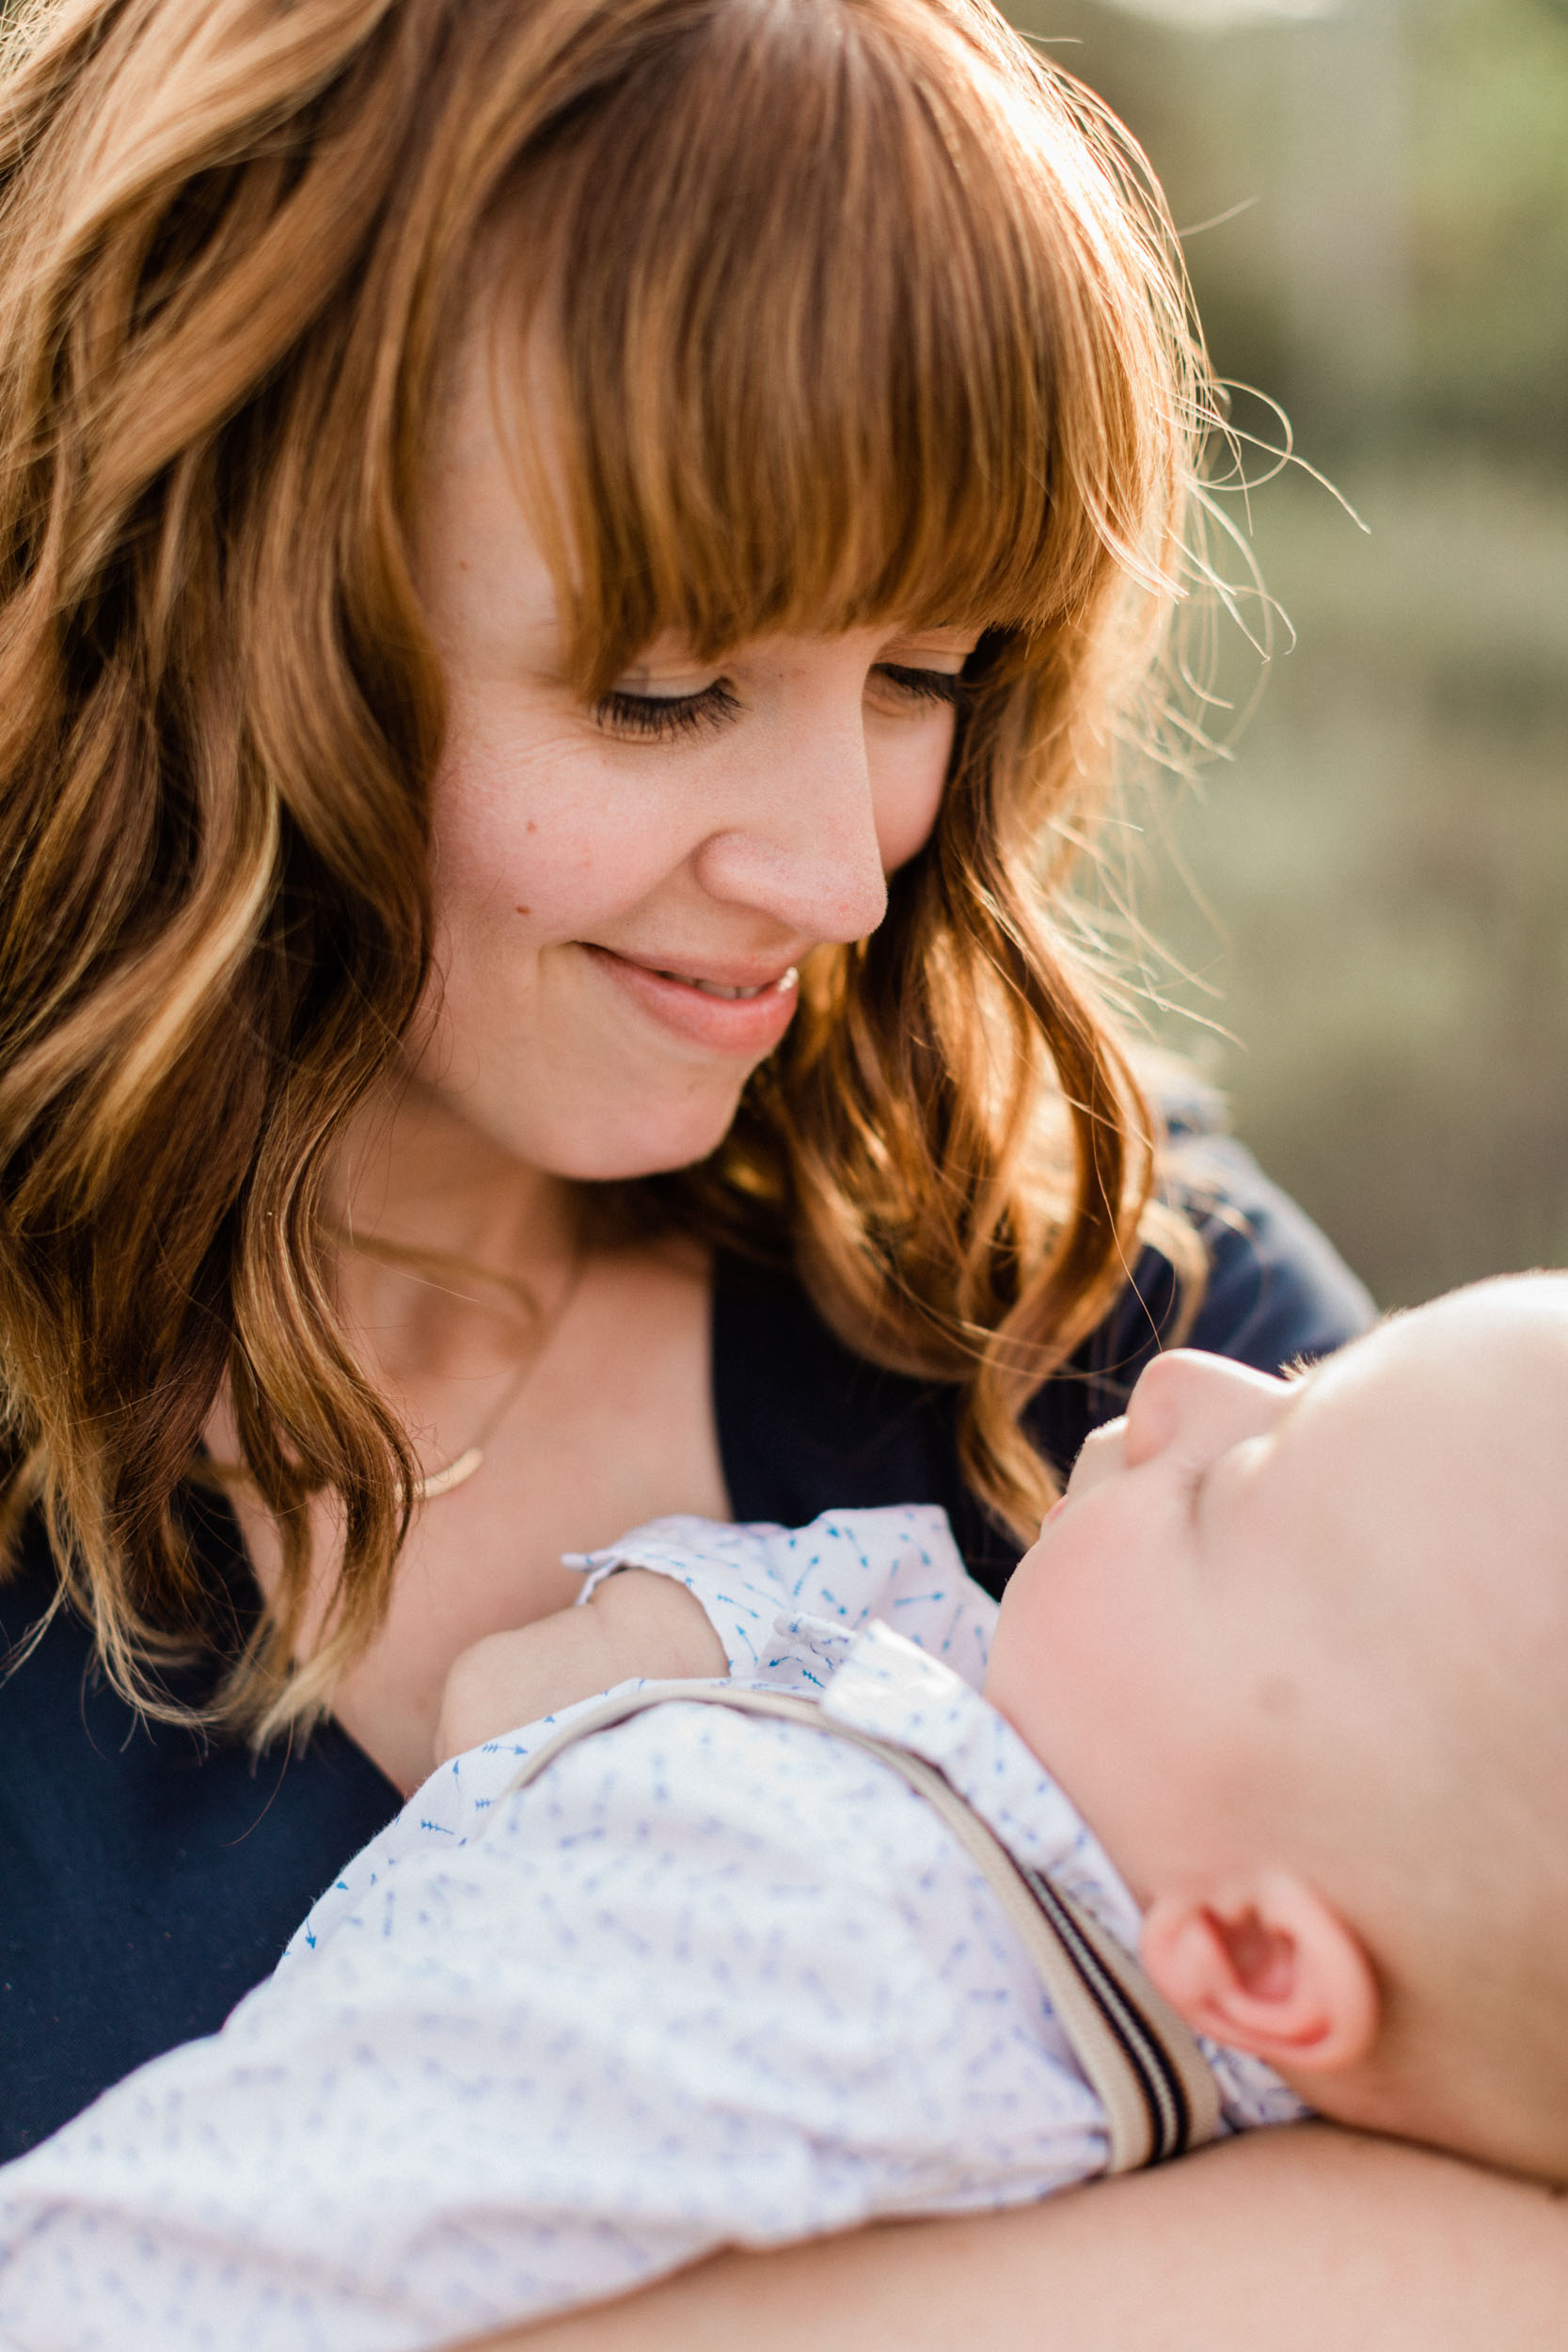 BKM-Photography-Pasadena-Los-Angeles-Family-Photographer-Mini-Sessions-0001-16.jpg